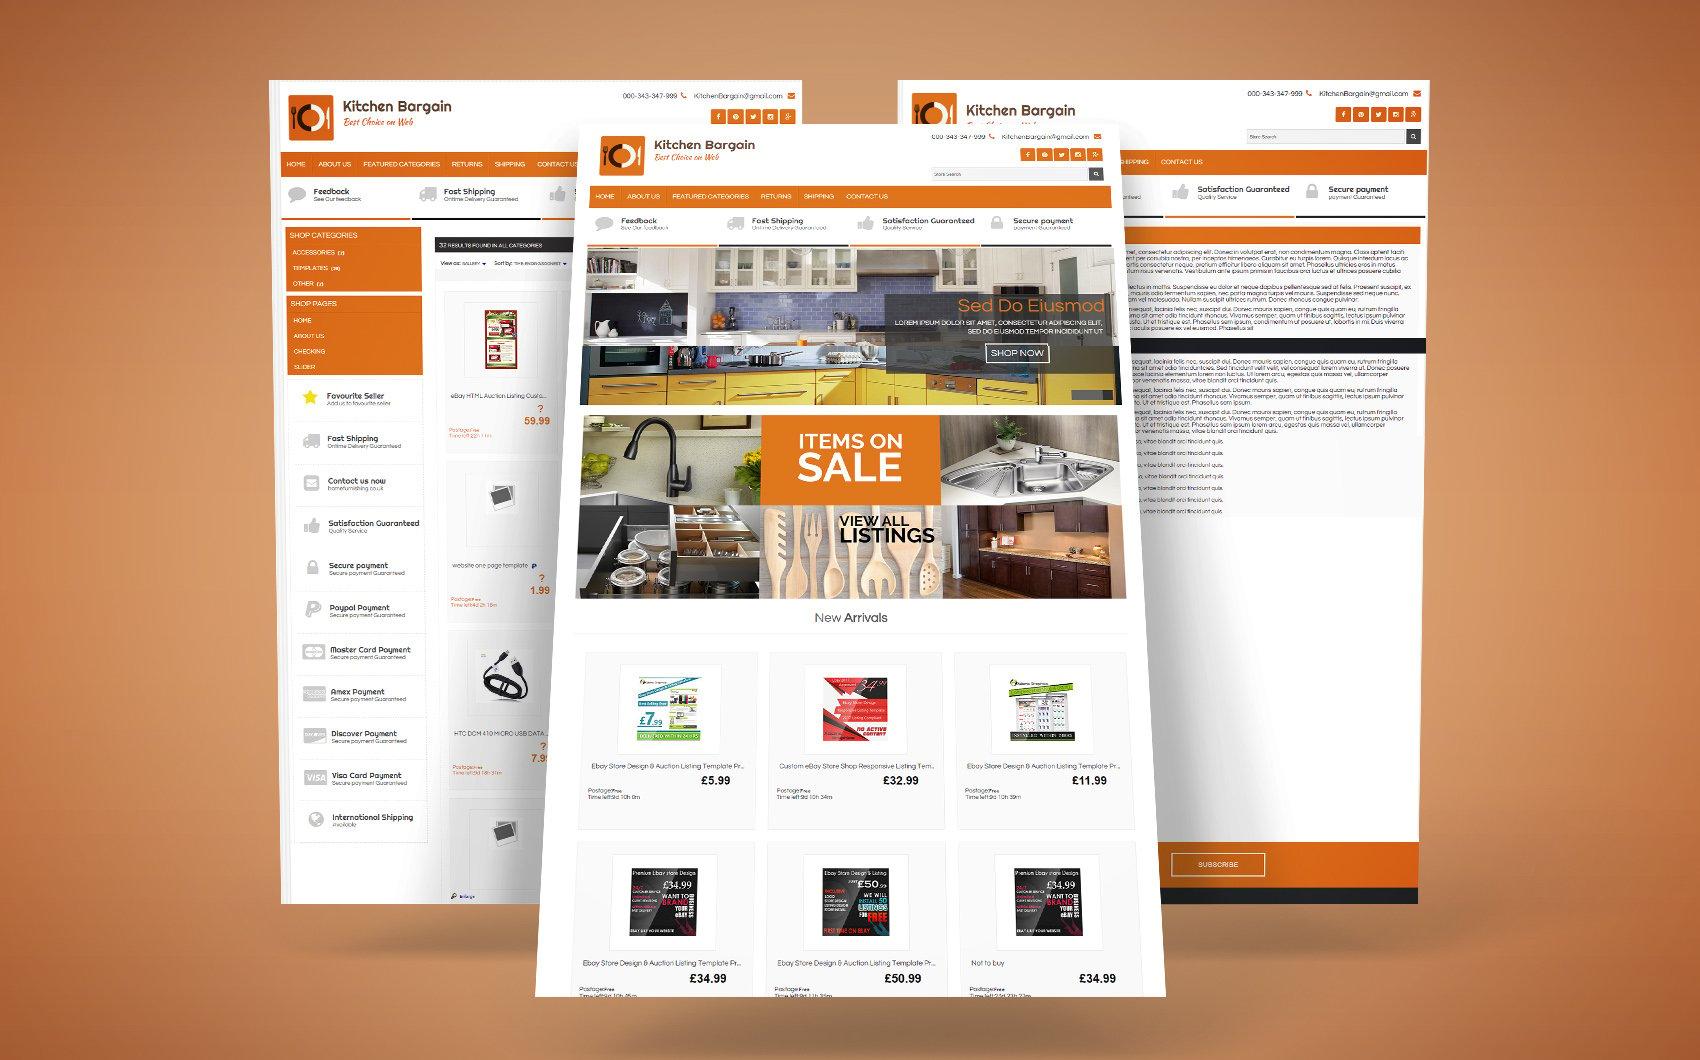 Kitchen Bargains EBay Template - screenshot